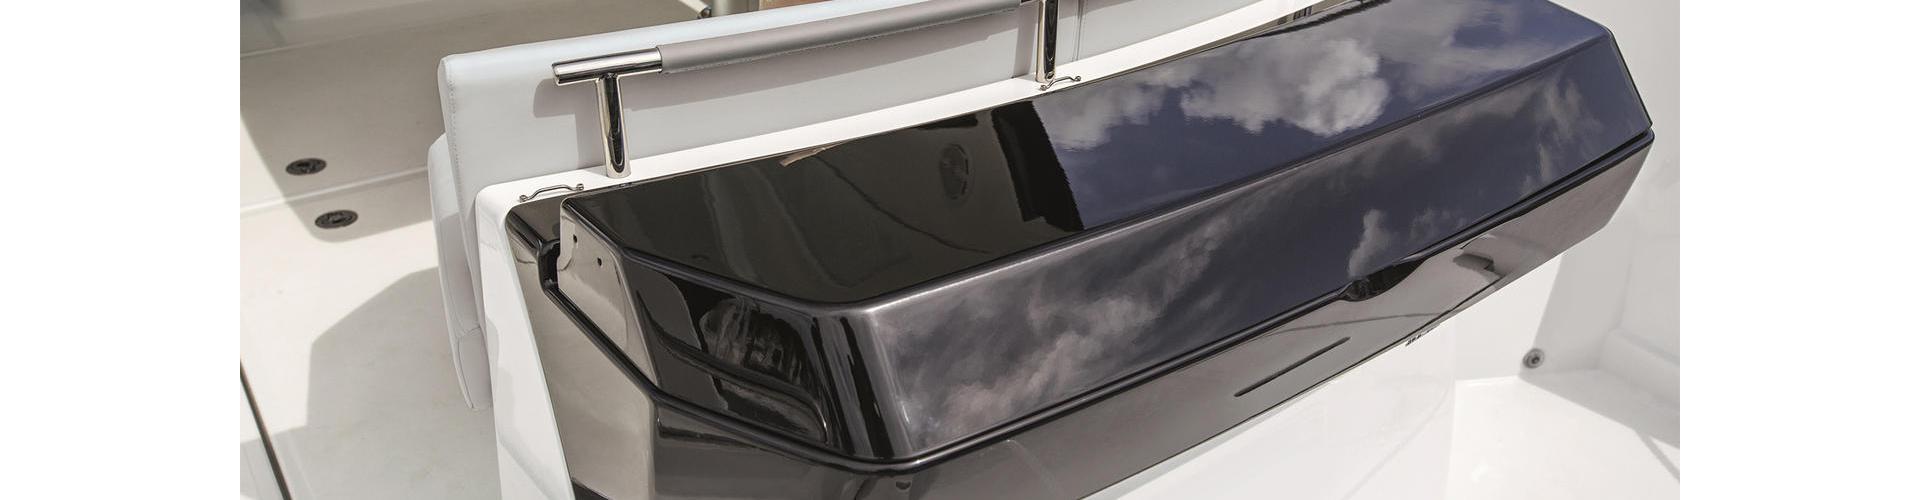 barca a motore Beneteau GT40